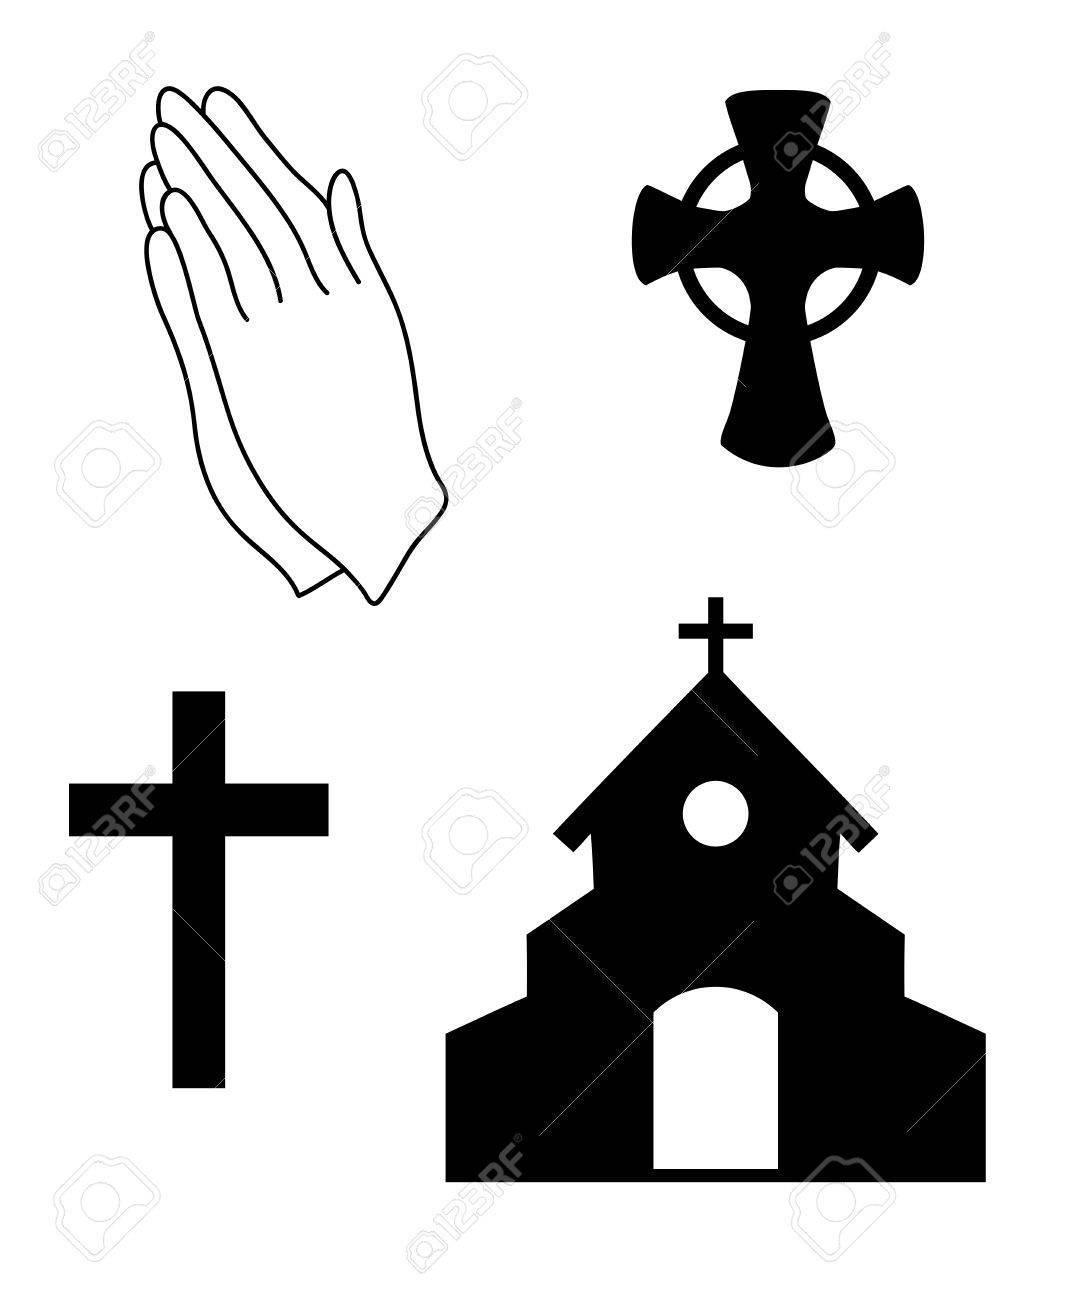 Vector Illustration Of Christian Faith Church Symbols Praying